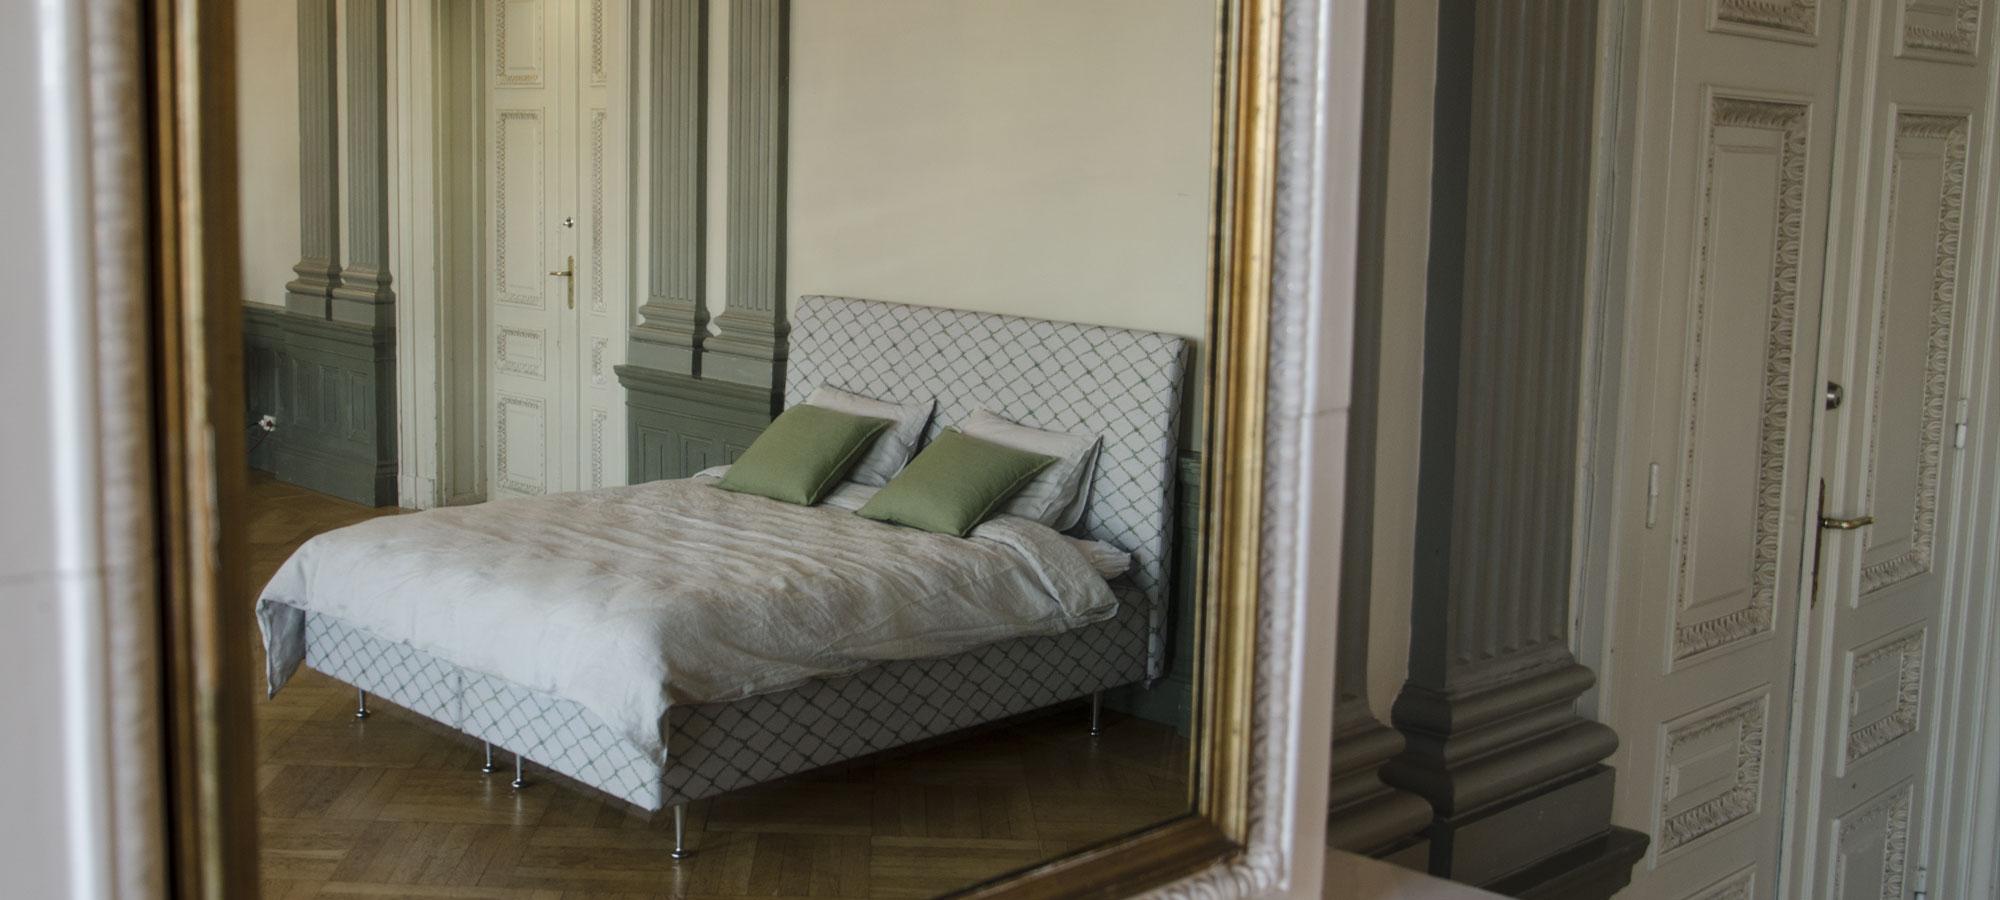 Sängar Lectus drömsäng säng grön